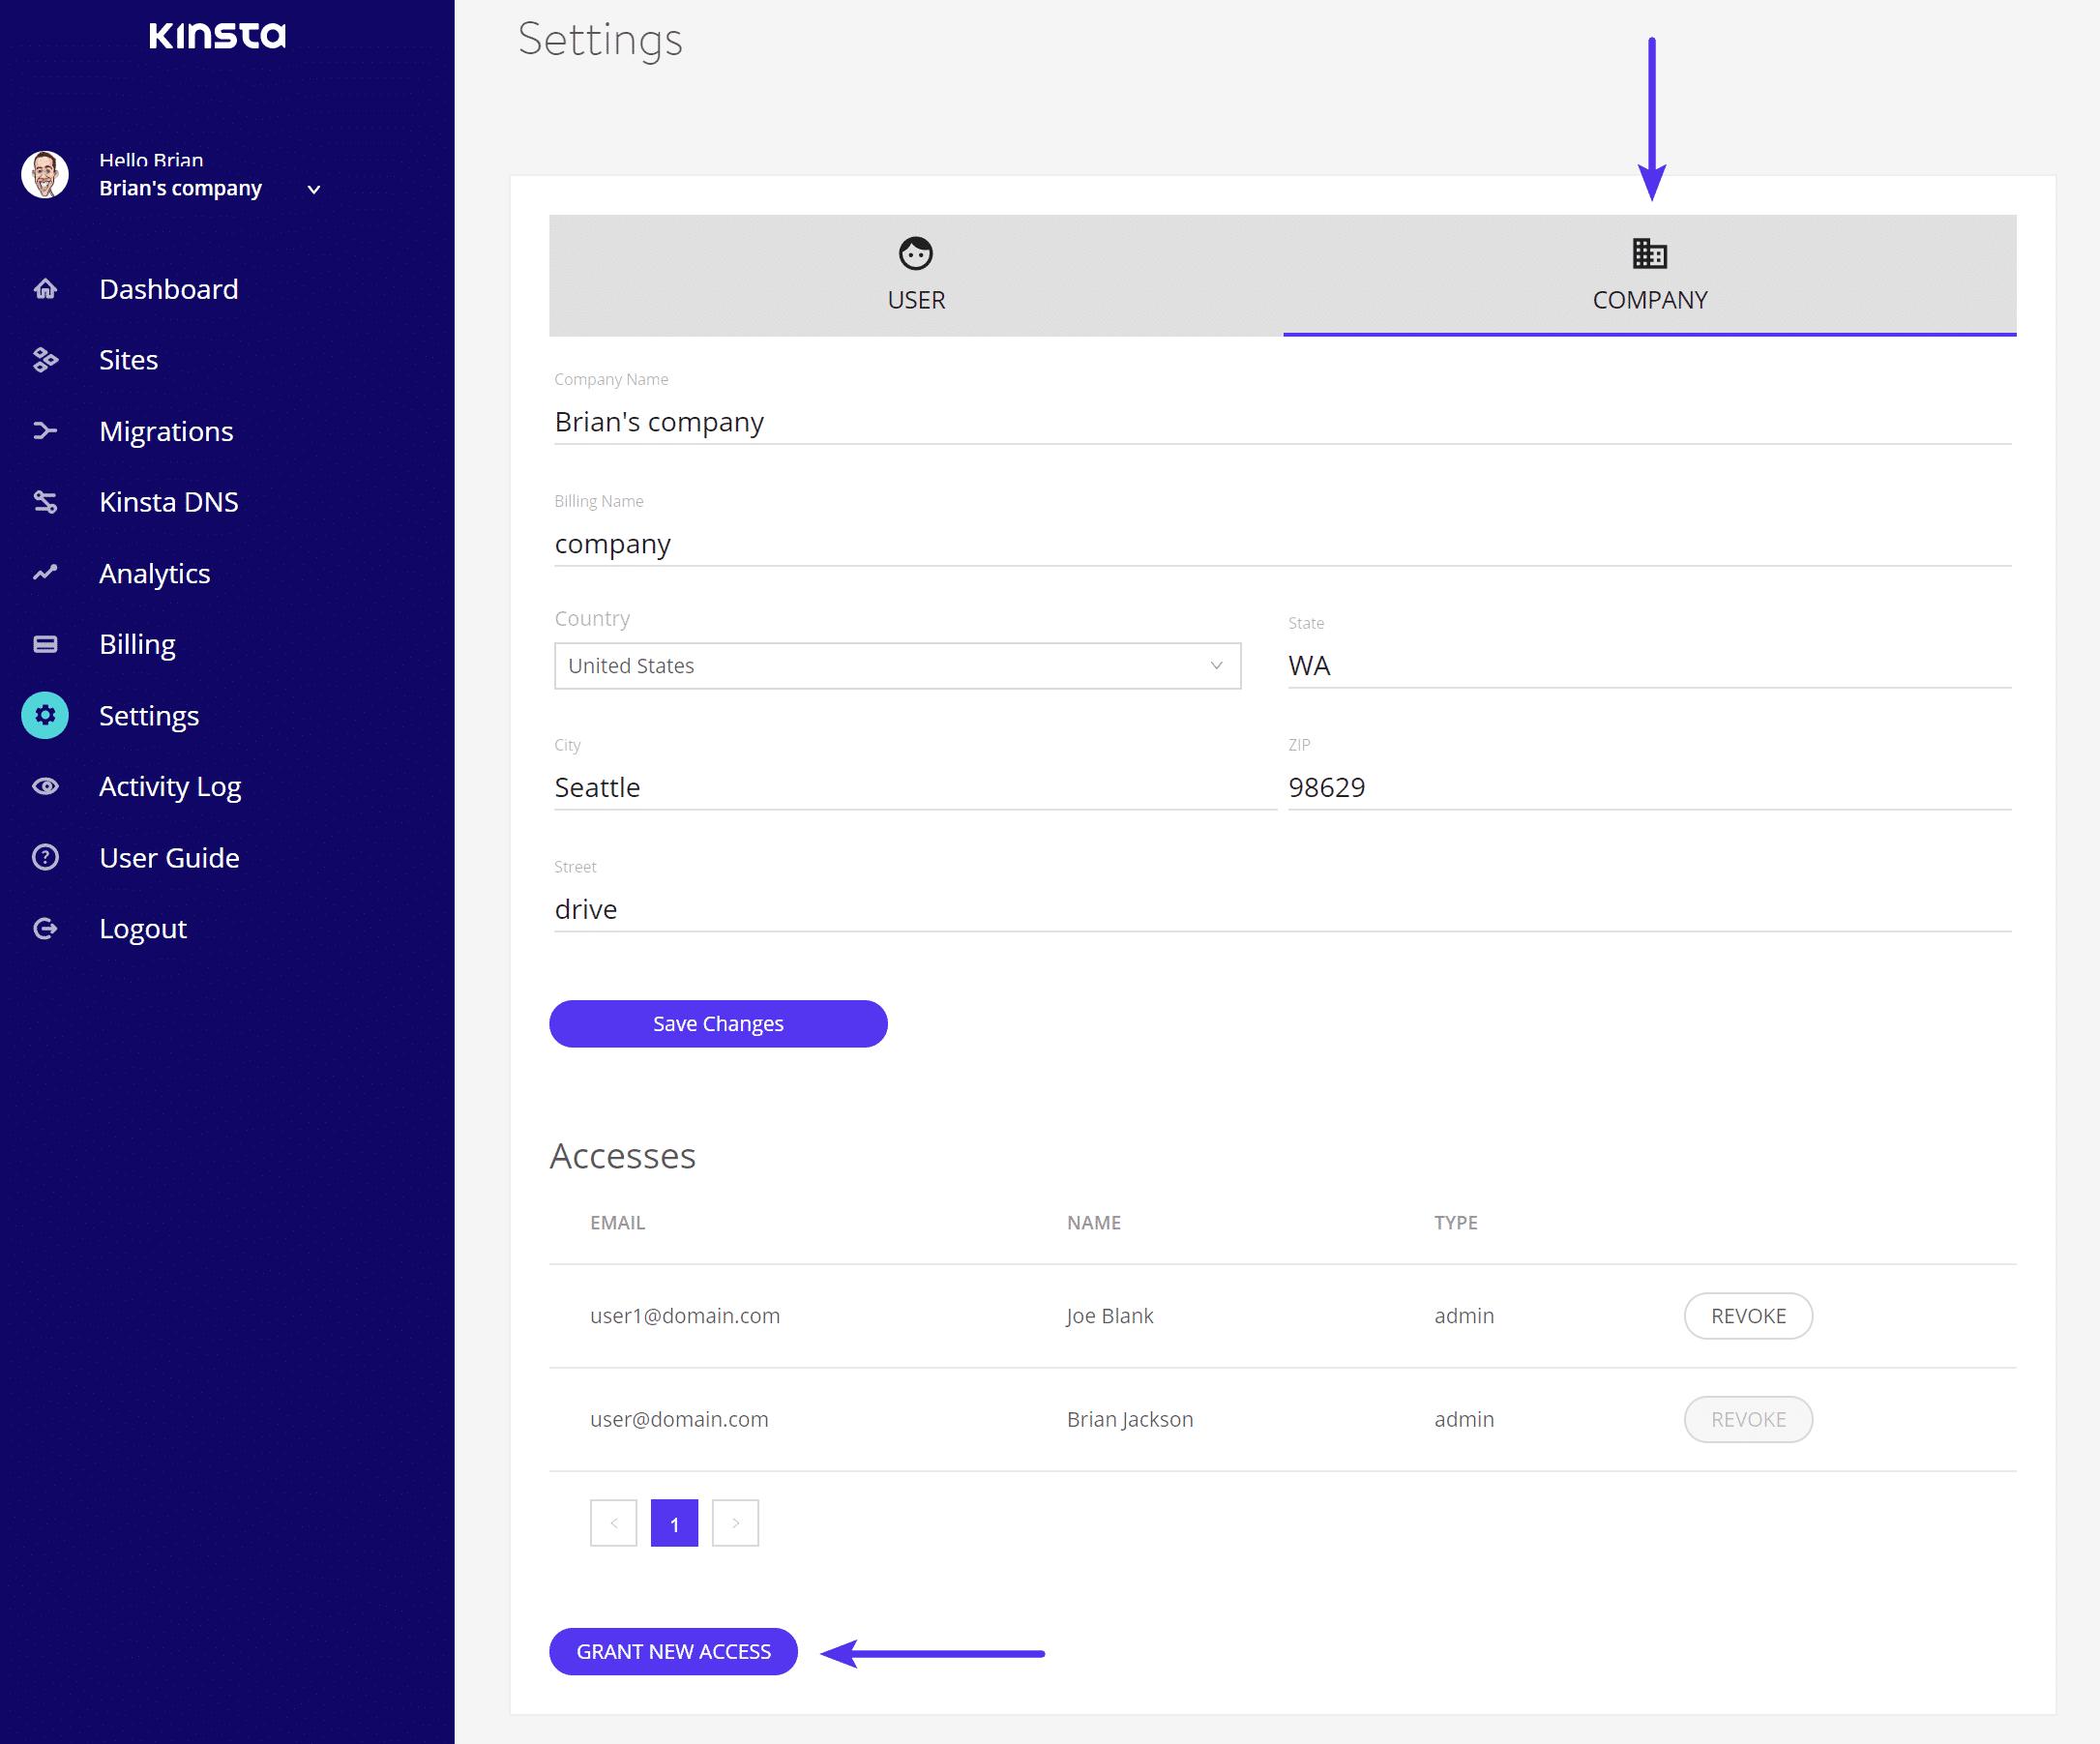 Accorder un nouvel accès MyKinsta